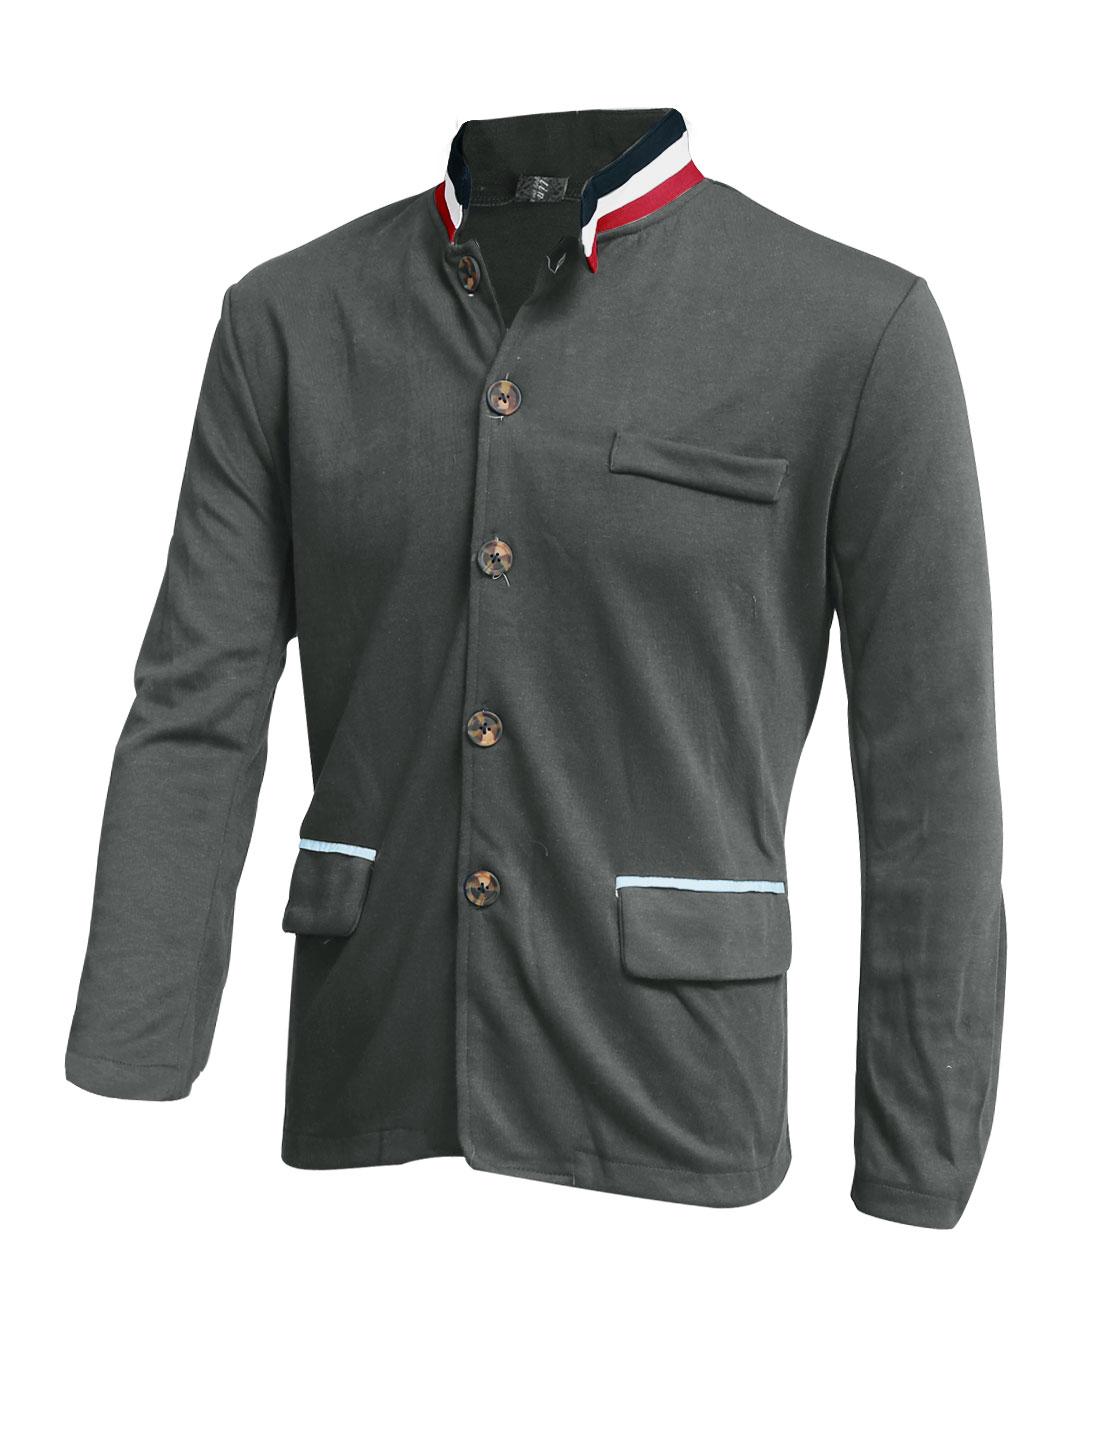 Men Stand Collar Flap Pockets Front Leisure Light Jacket Dark Gray M